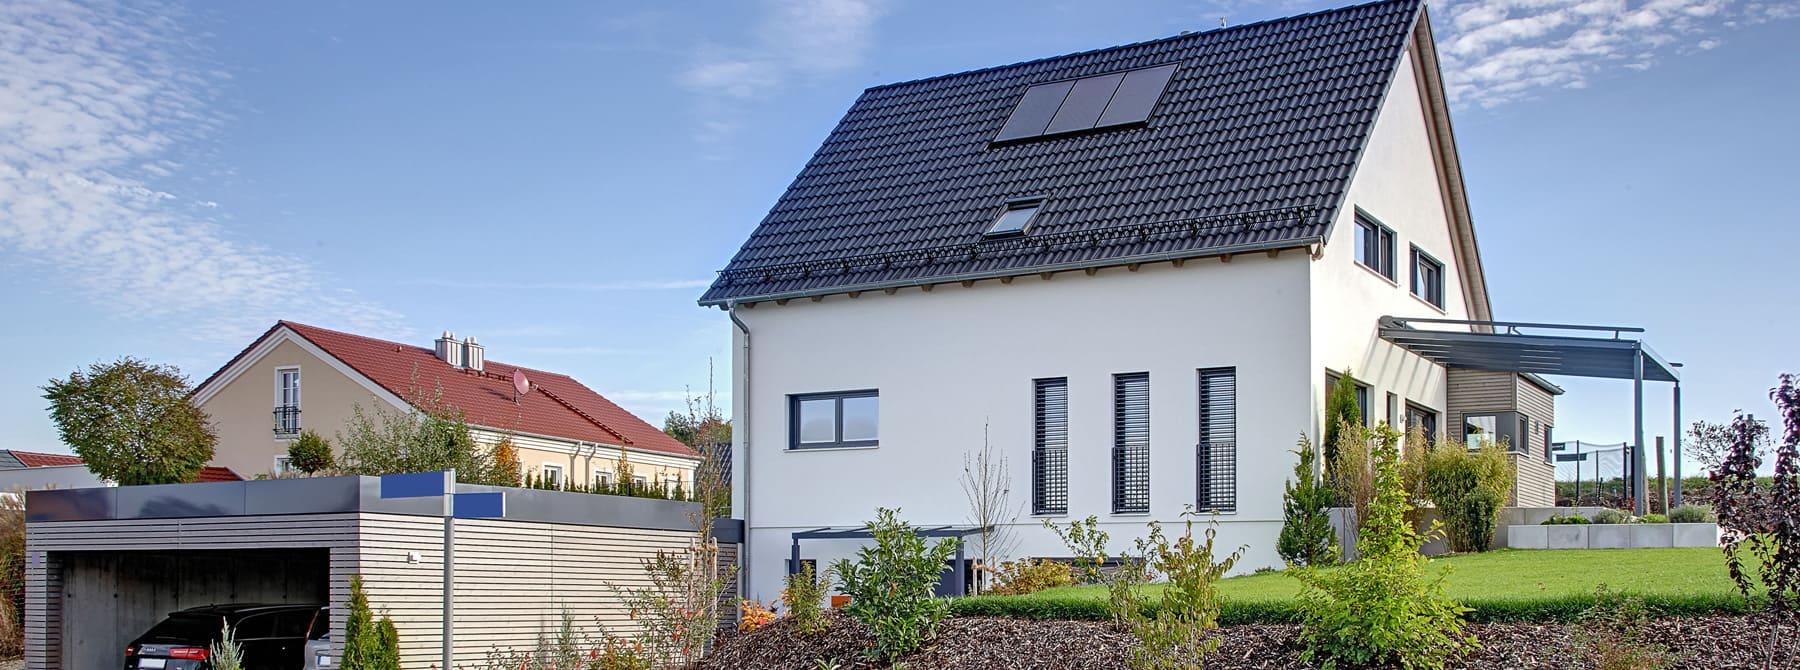 Kundenhaus Hegger - Junges Wohnen am Hang - von Sonnleitner.de ...